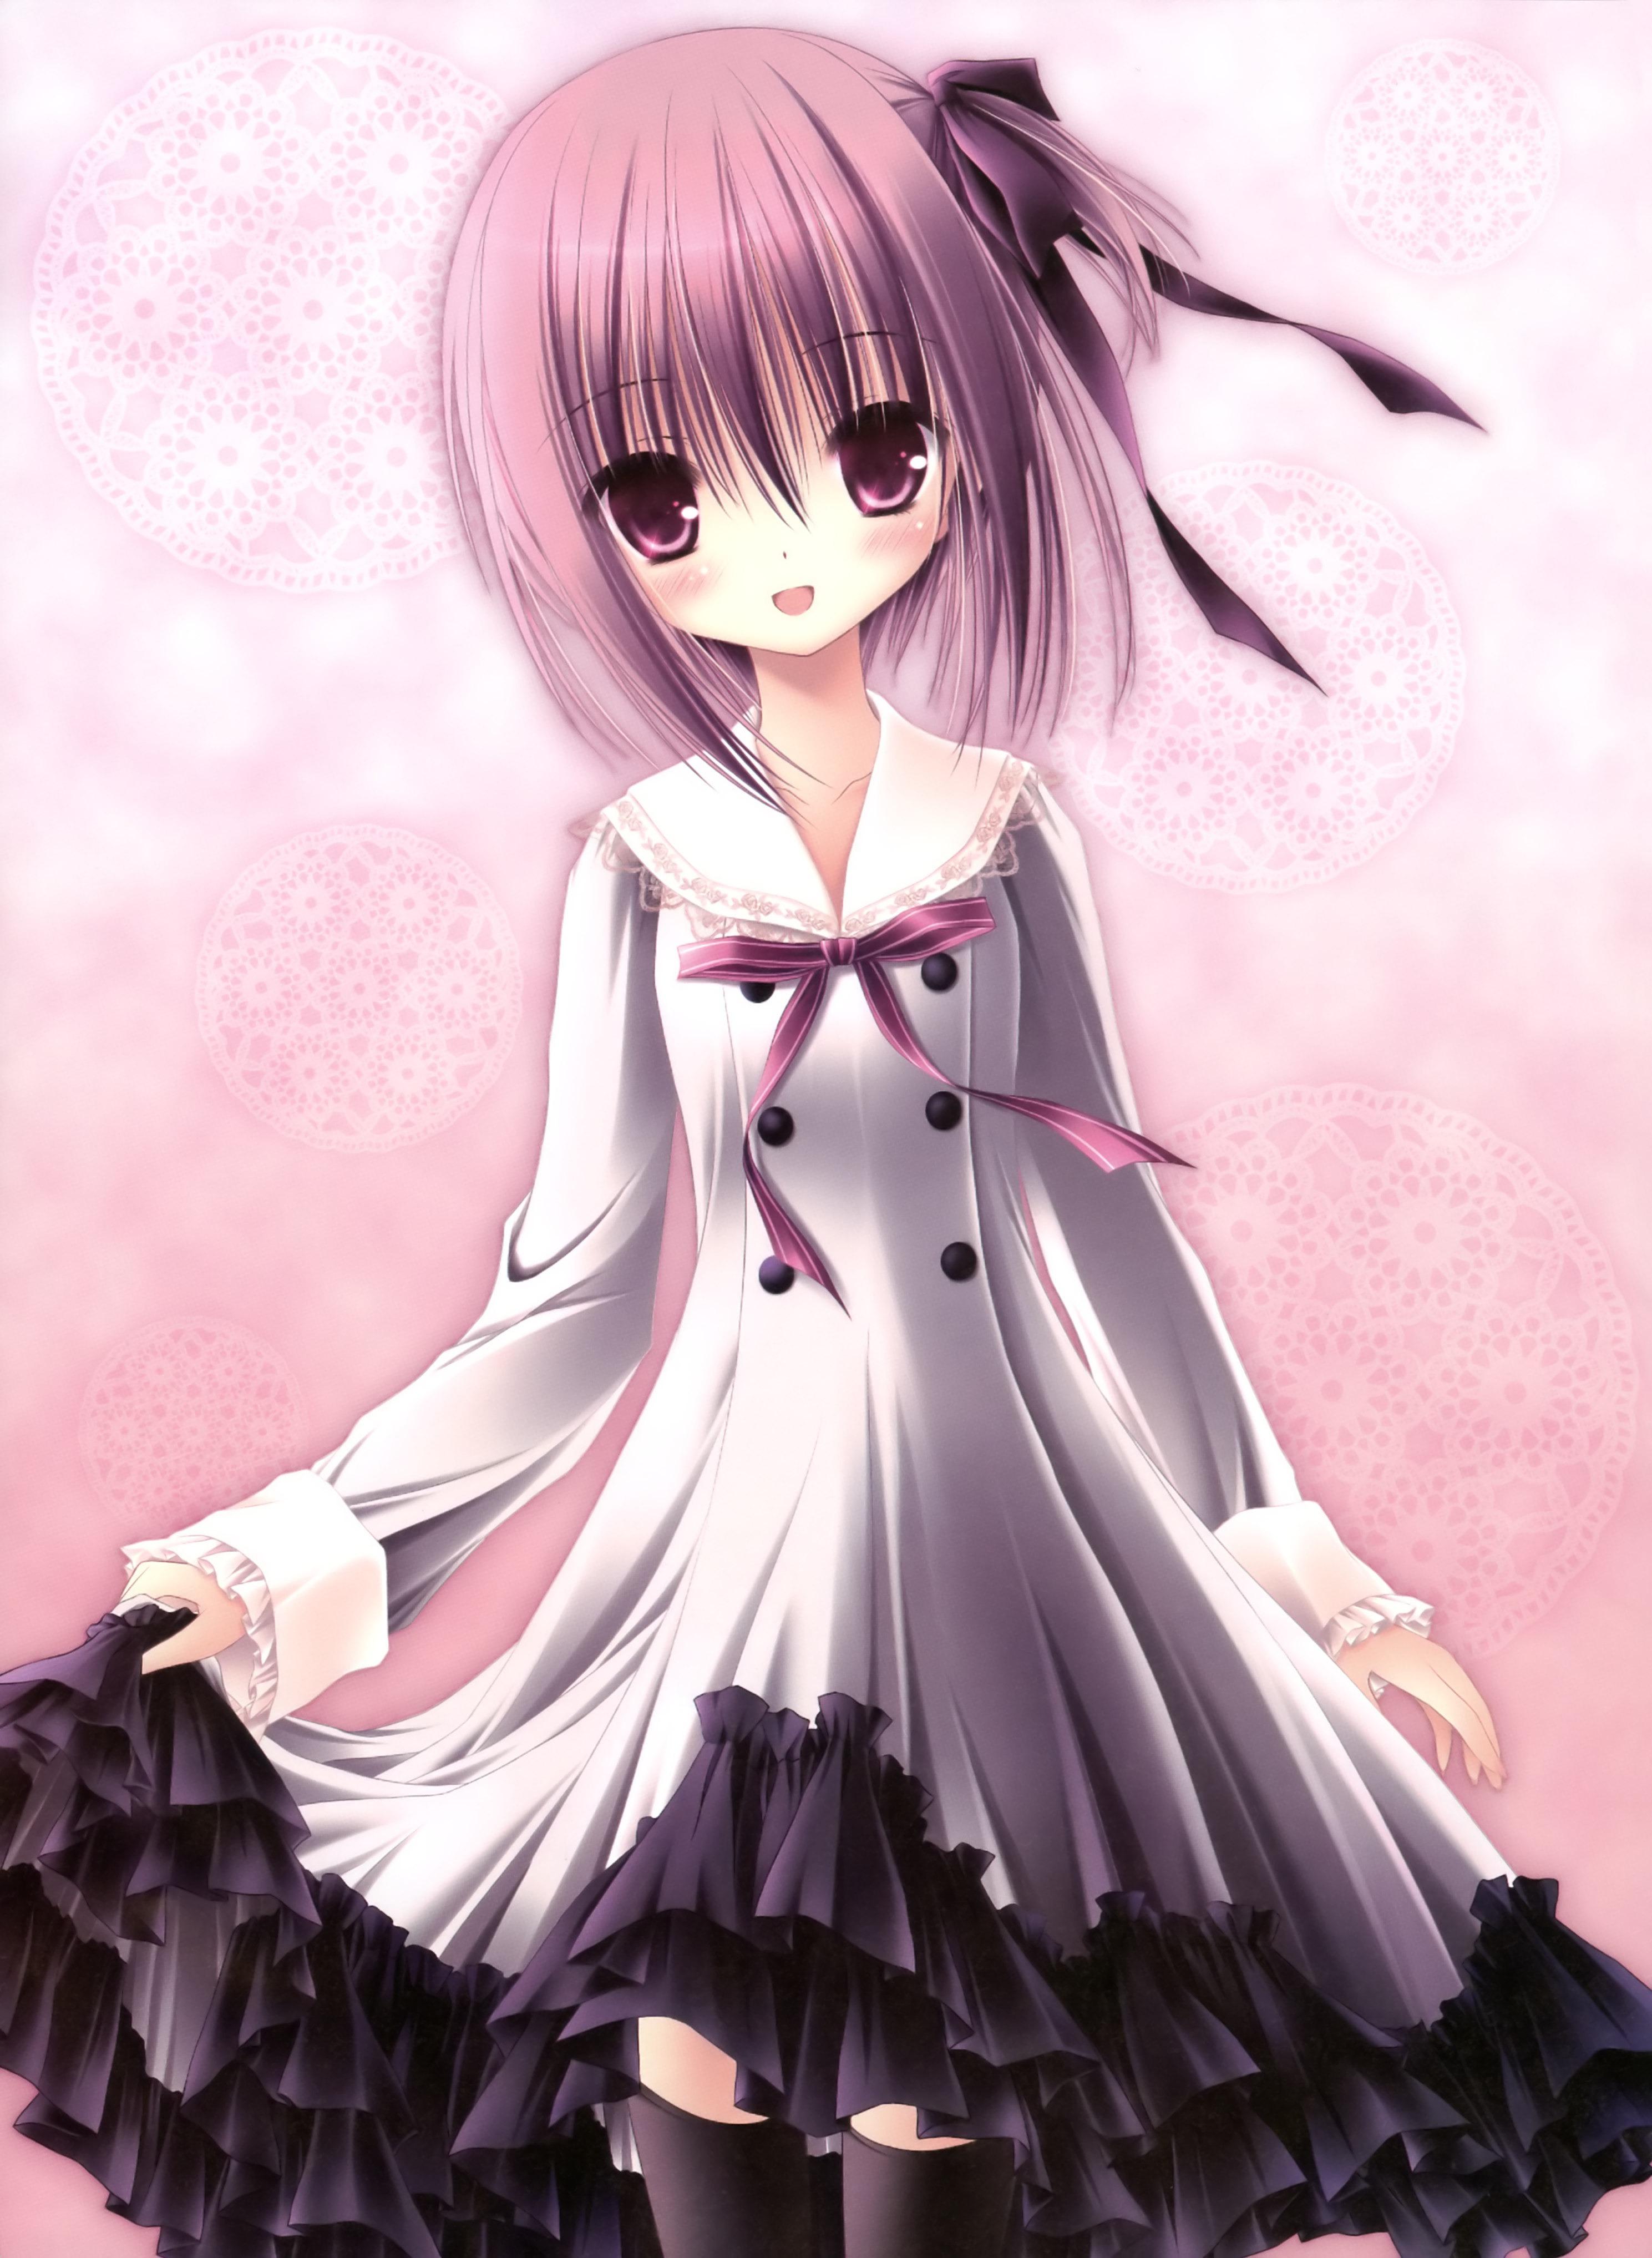 Tinkerbell zerochan anime image board for Zerochan anime